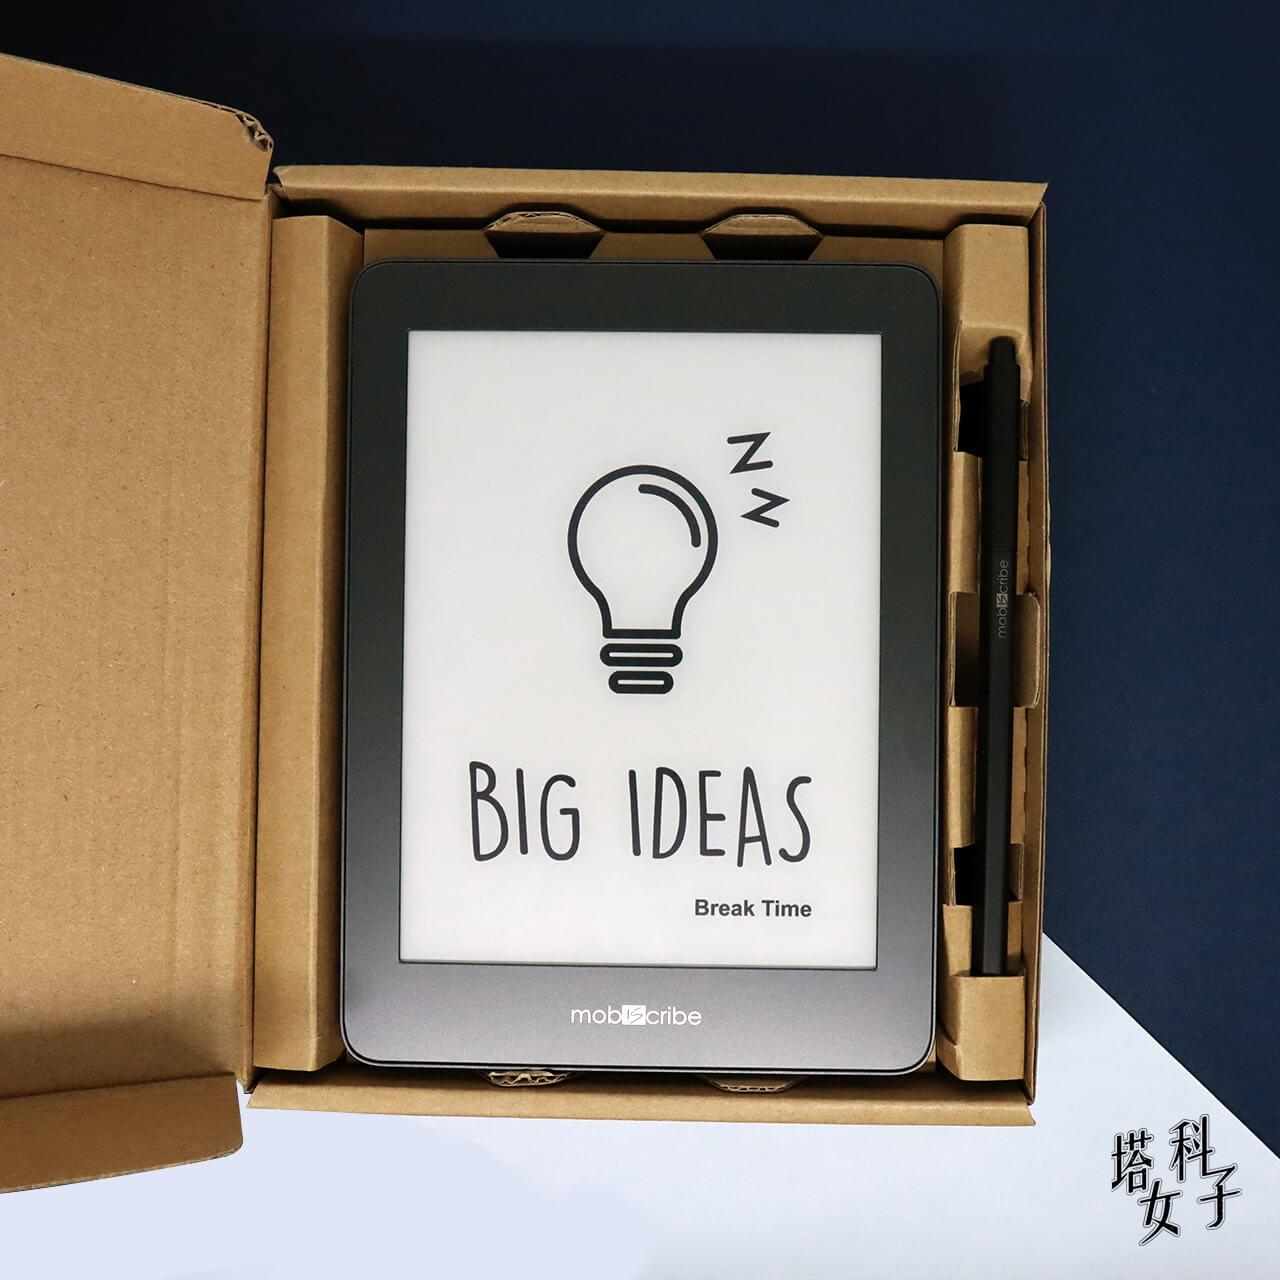 Mobiscribe 電子筆記本+閱讀器 開箱評測 外包裝